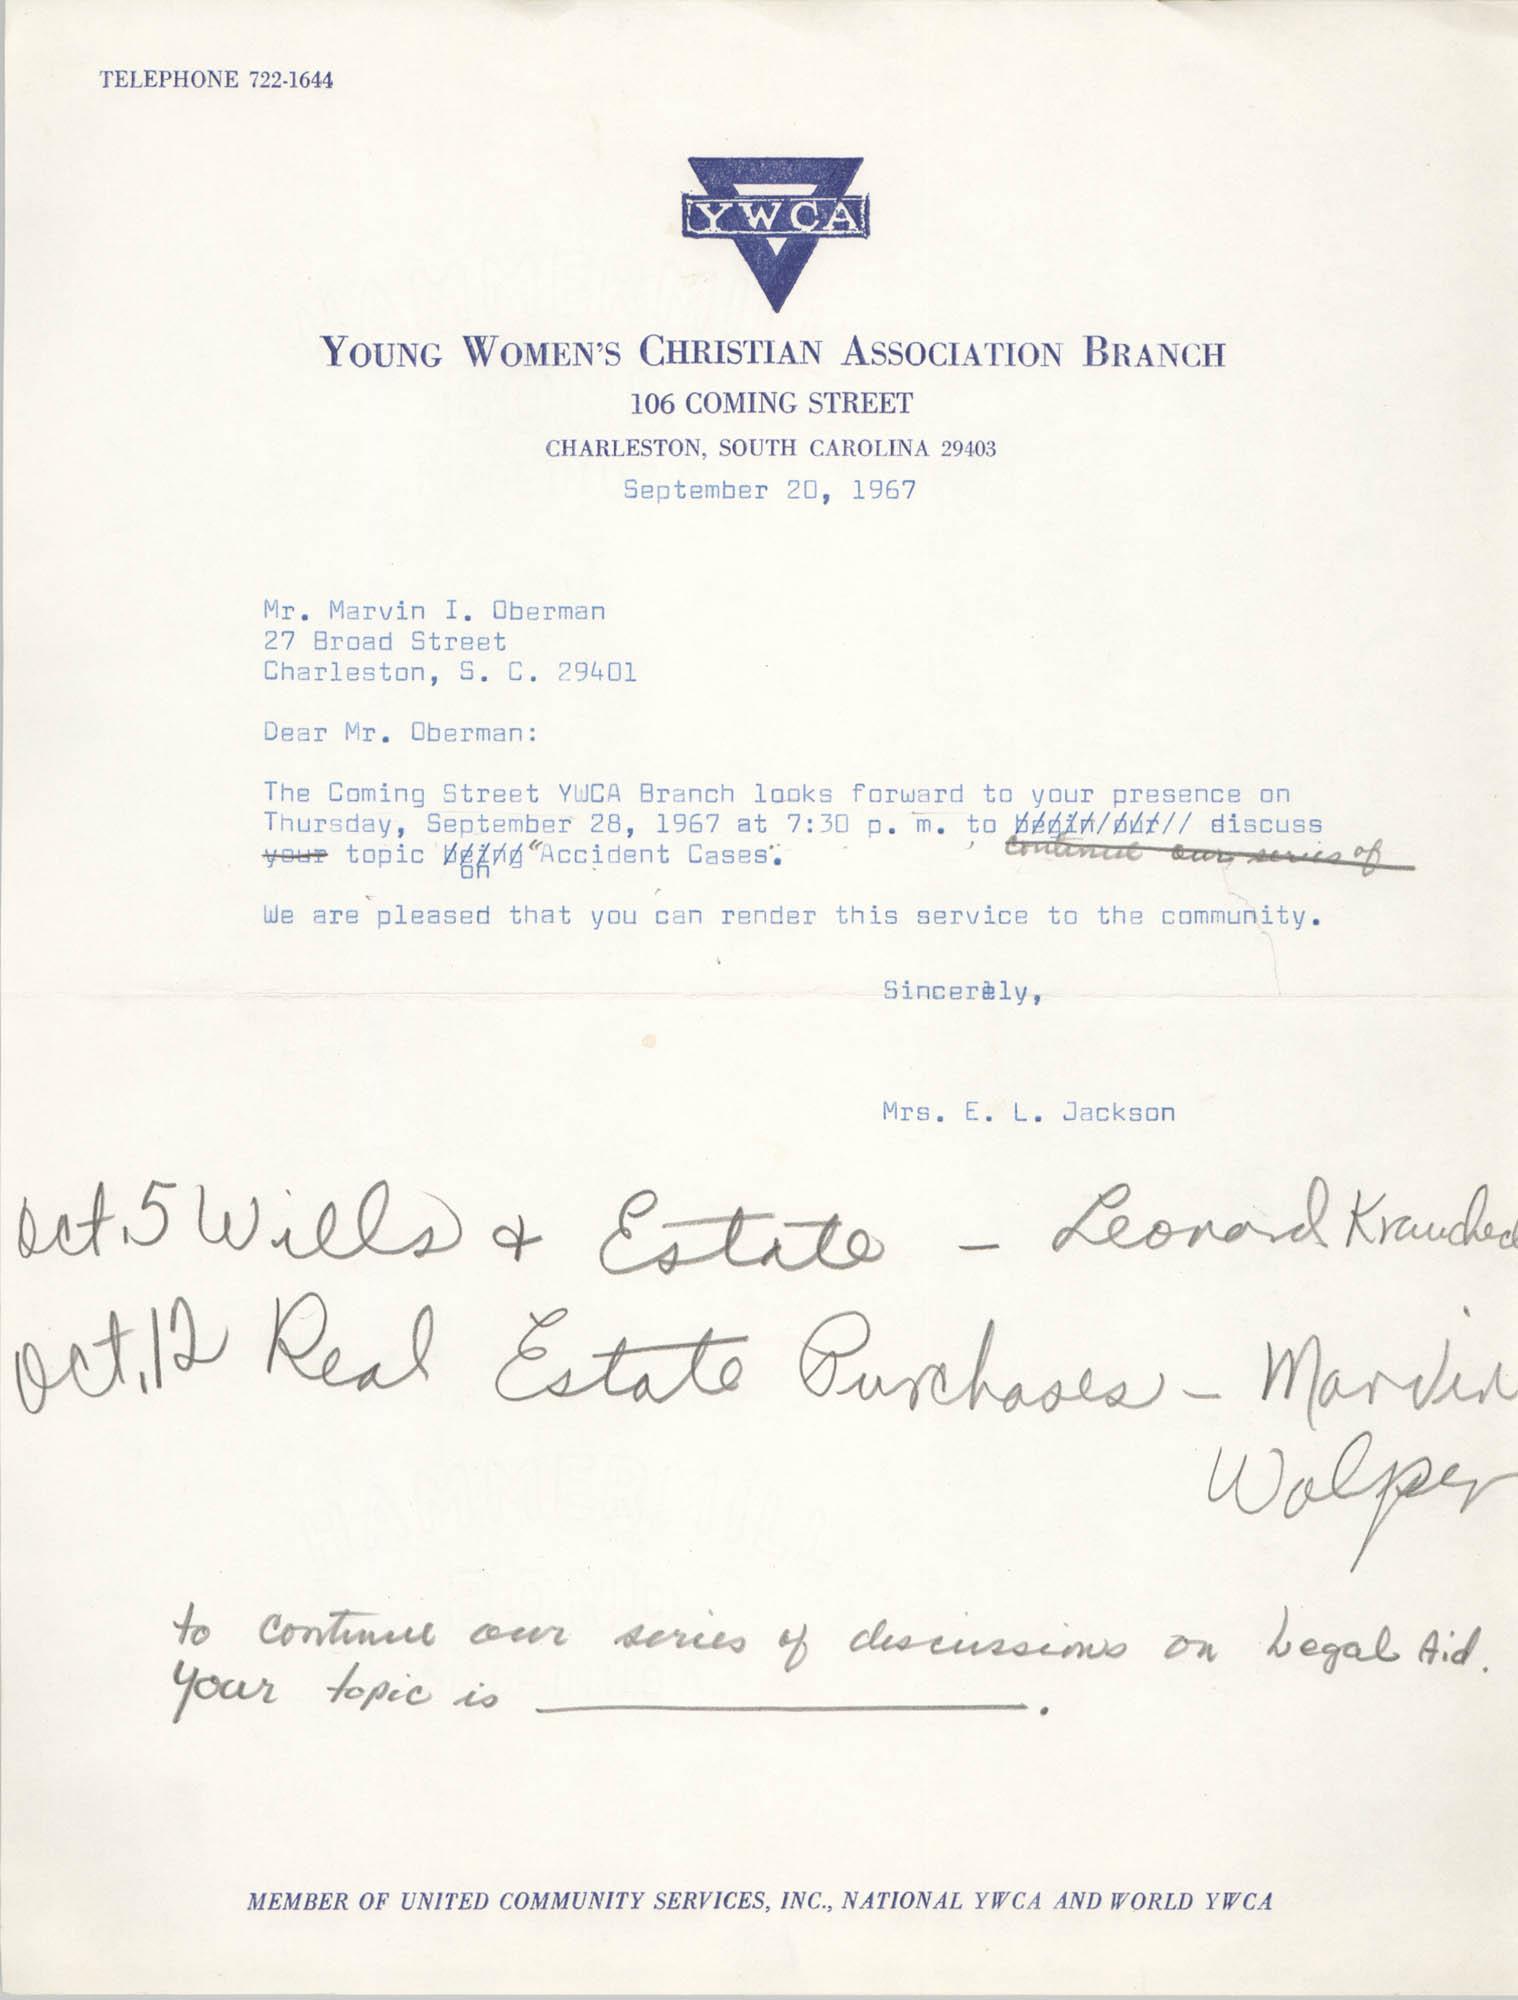 Letter from Christine O. Jackson to Marvin I. Oberman, September 20, 1967